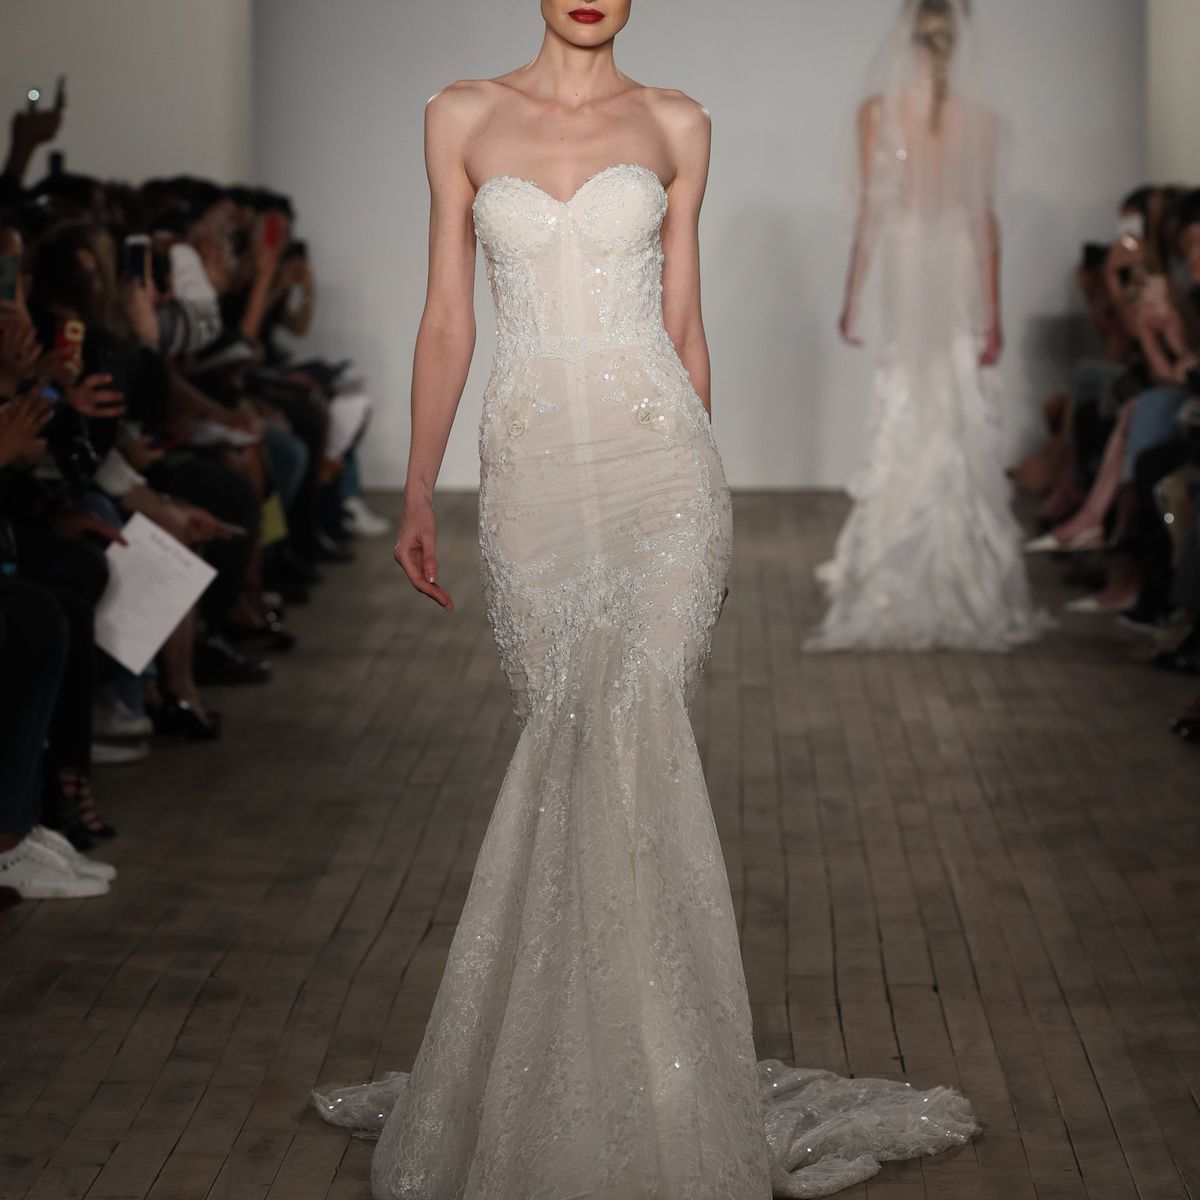 Model in embellished Inbal Dror VIP wedding dress